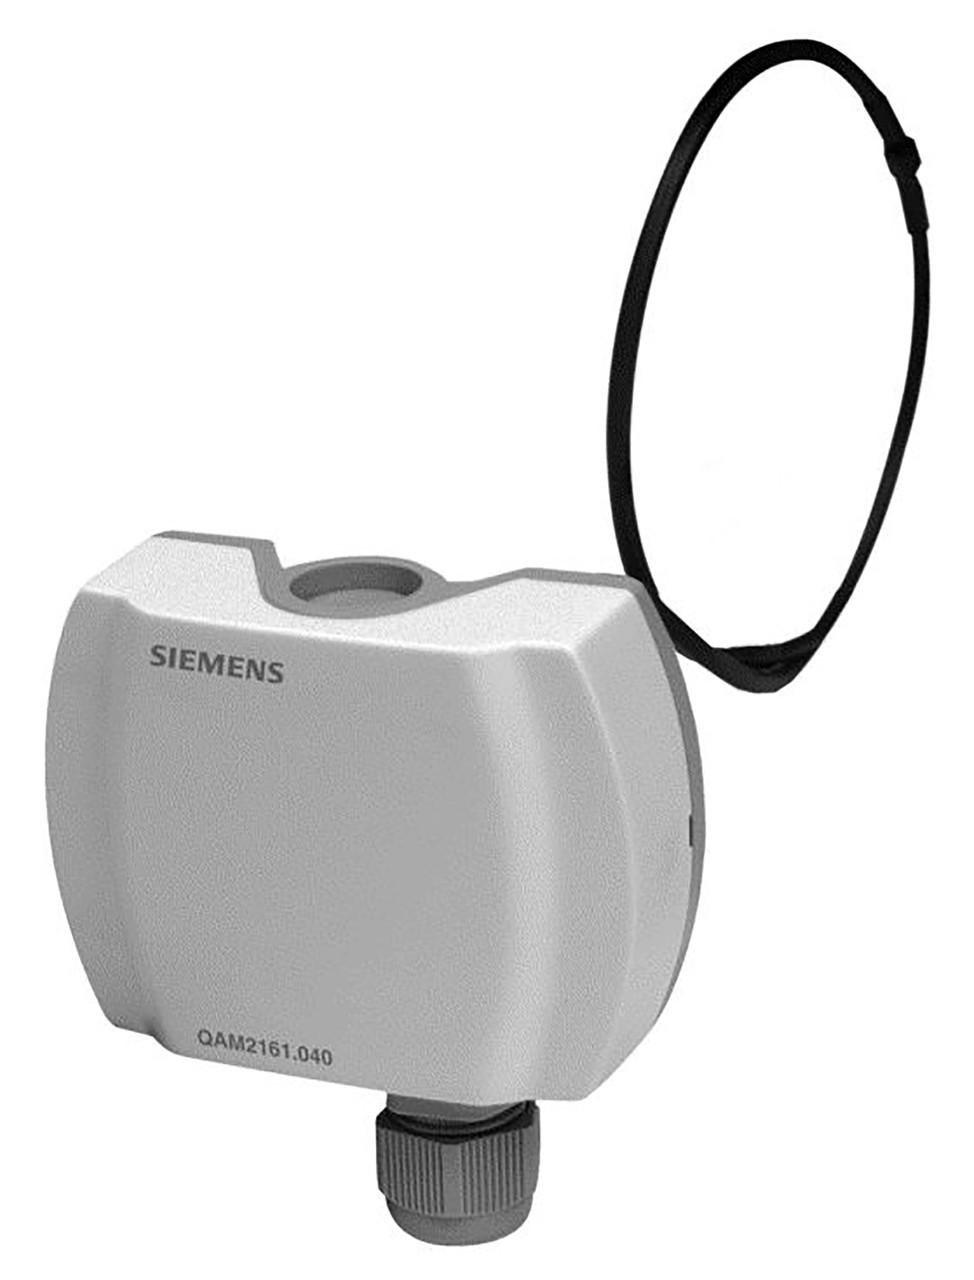 Siemens QAM2171.040